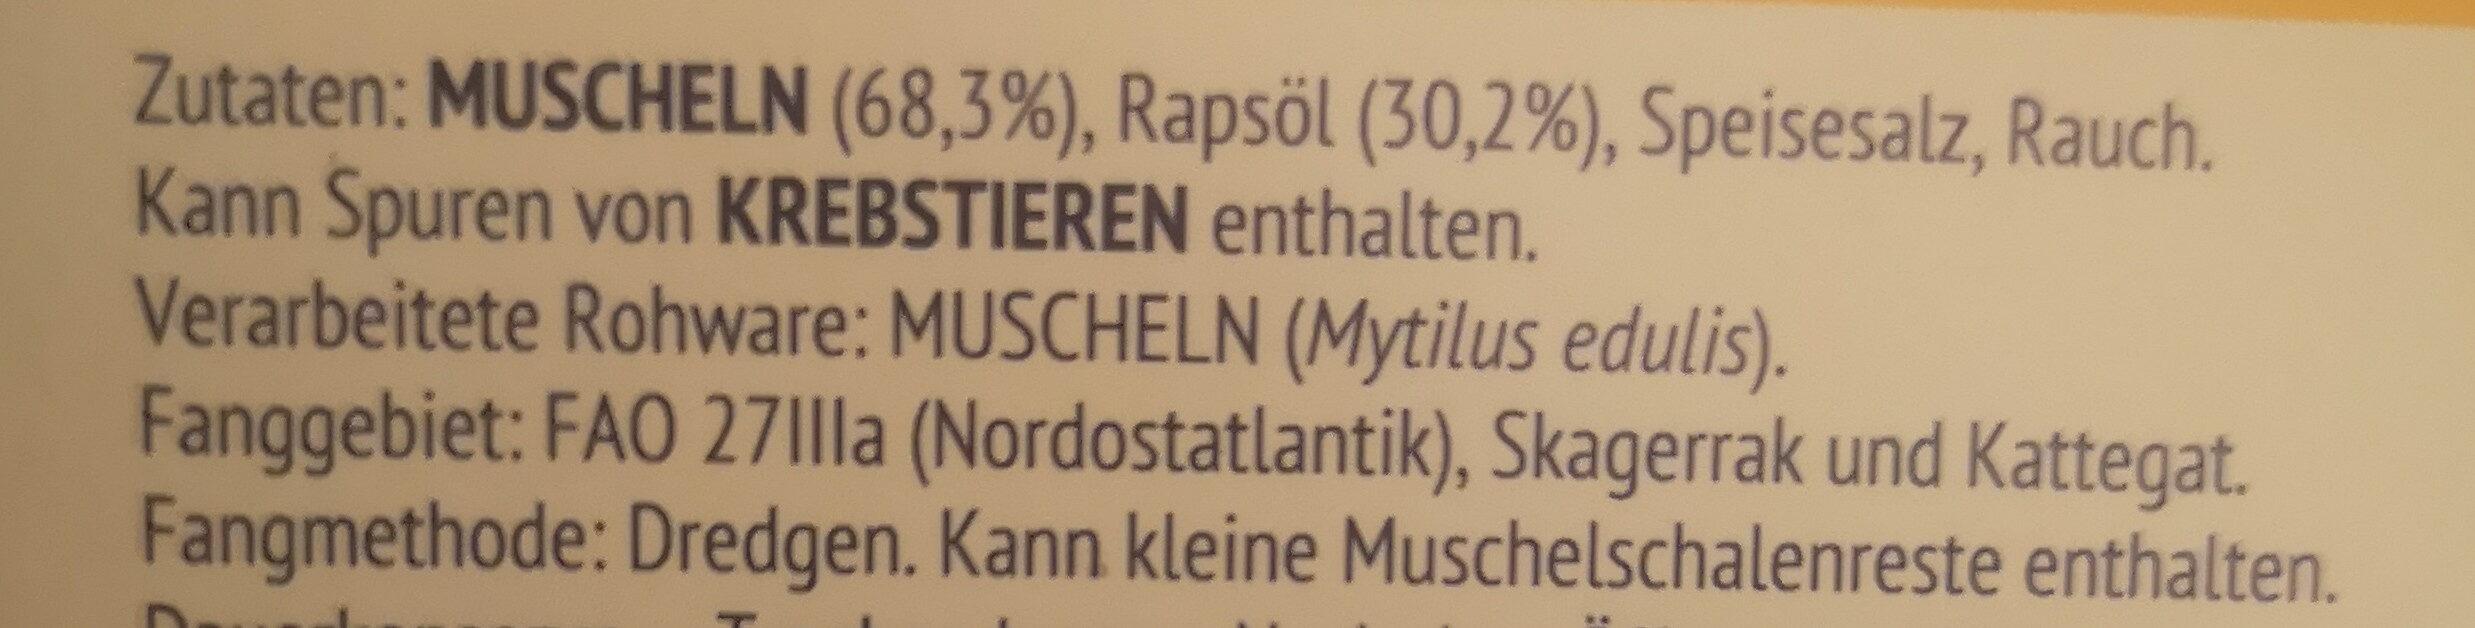 Geräucherte Muscheln in Rapsöl - Ingredients - de